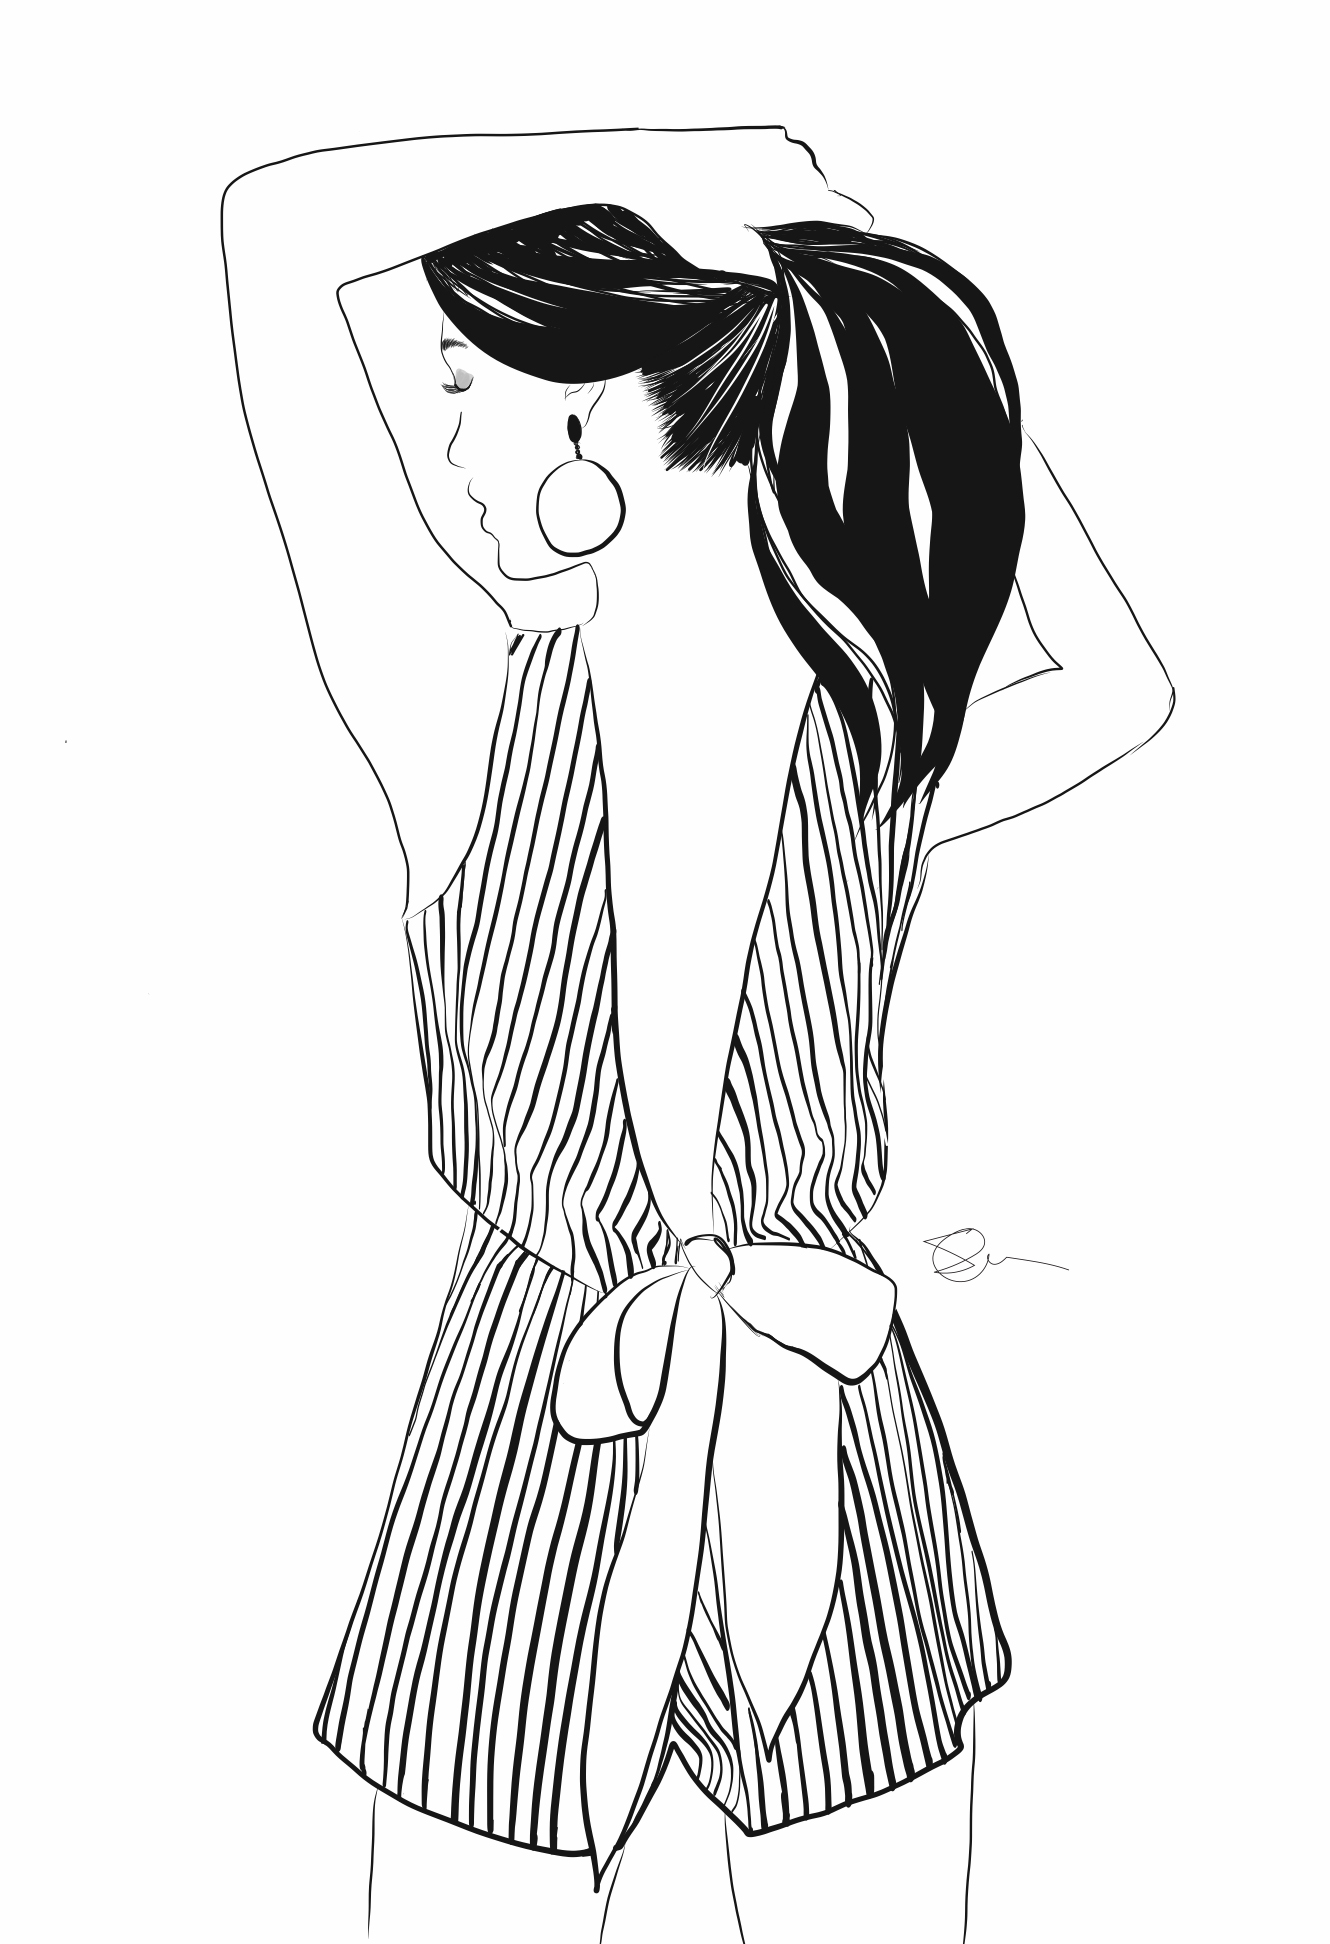 Romper Girl by Sandeep Gill.jpg